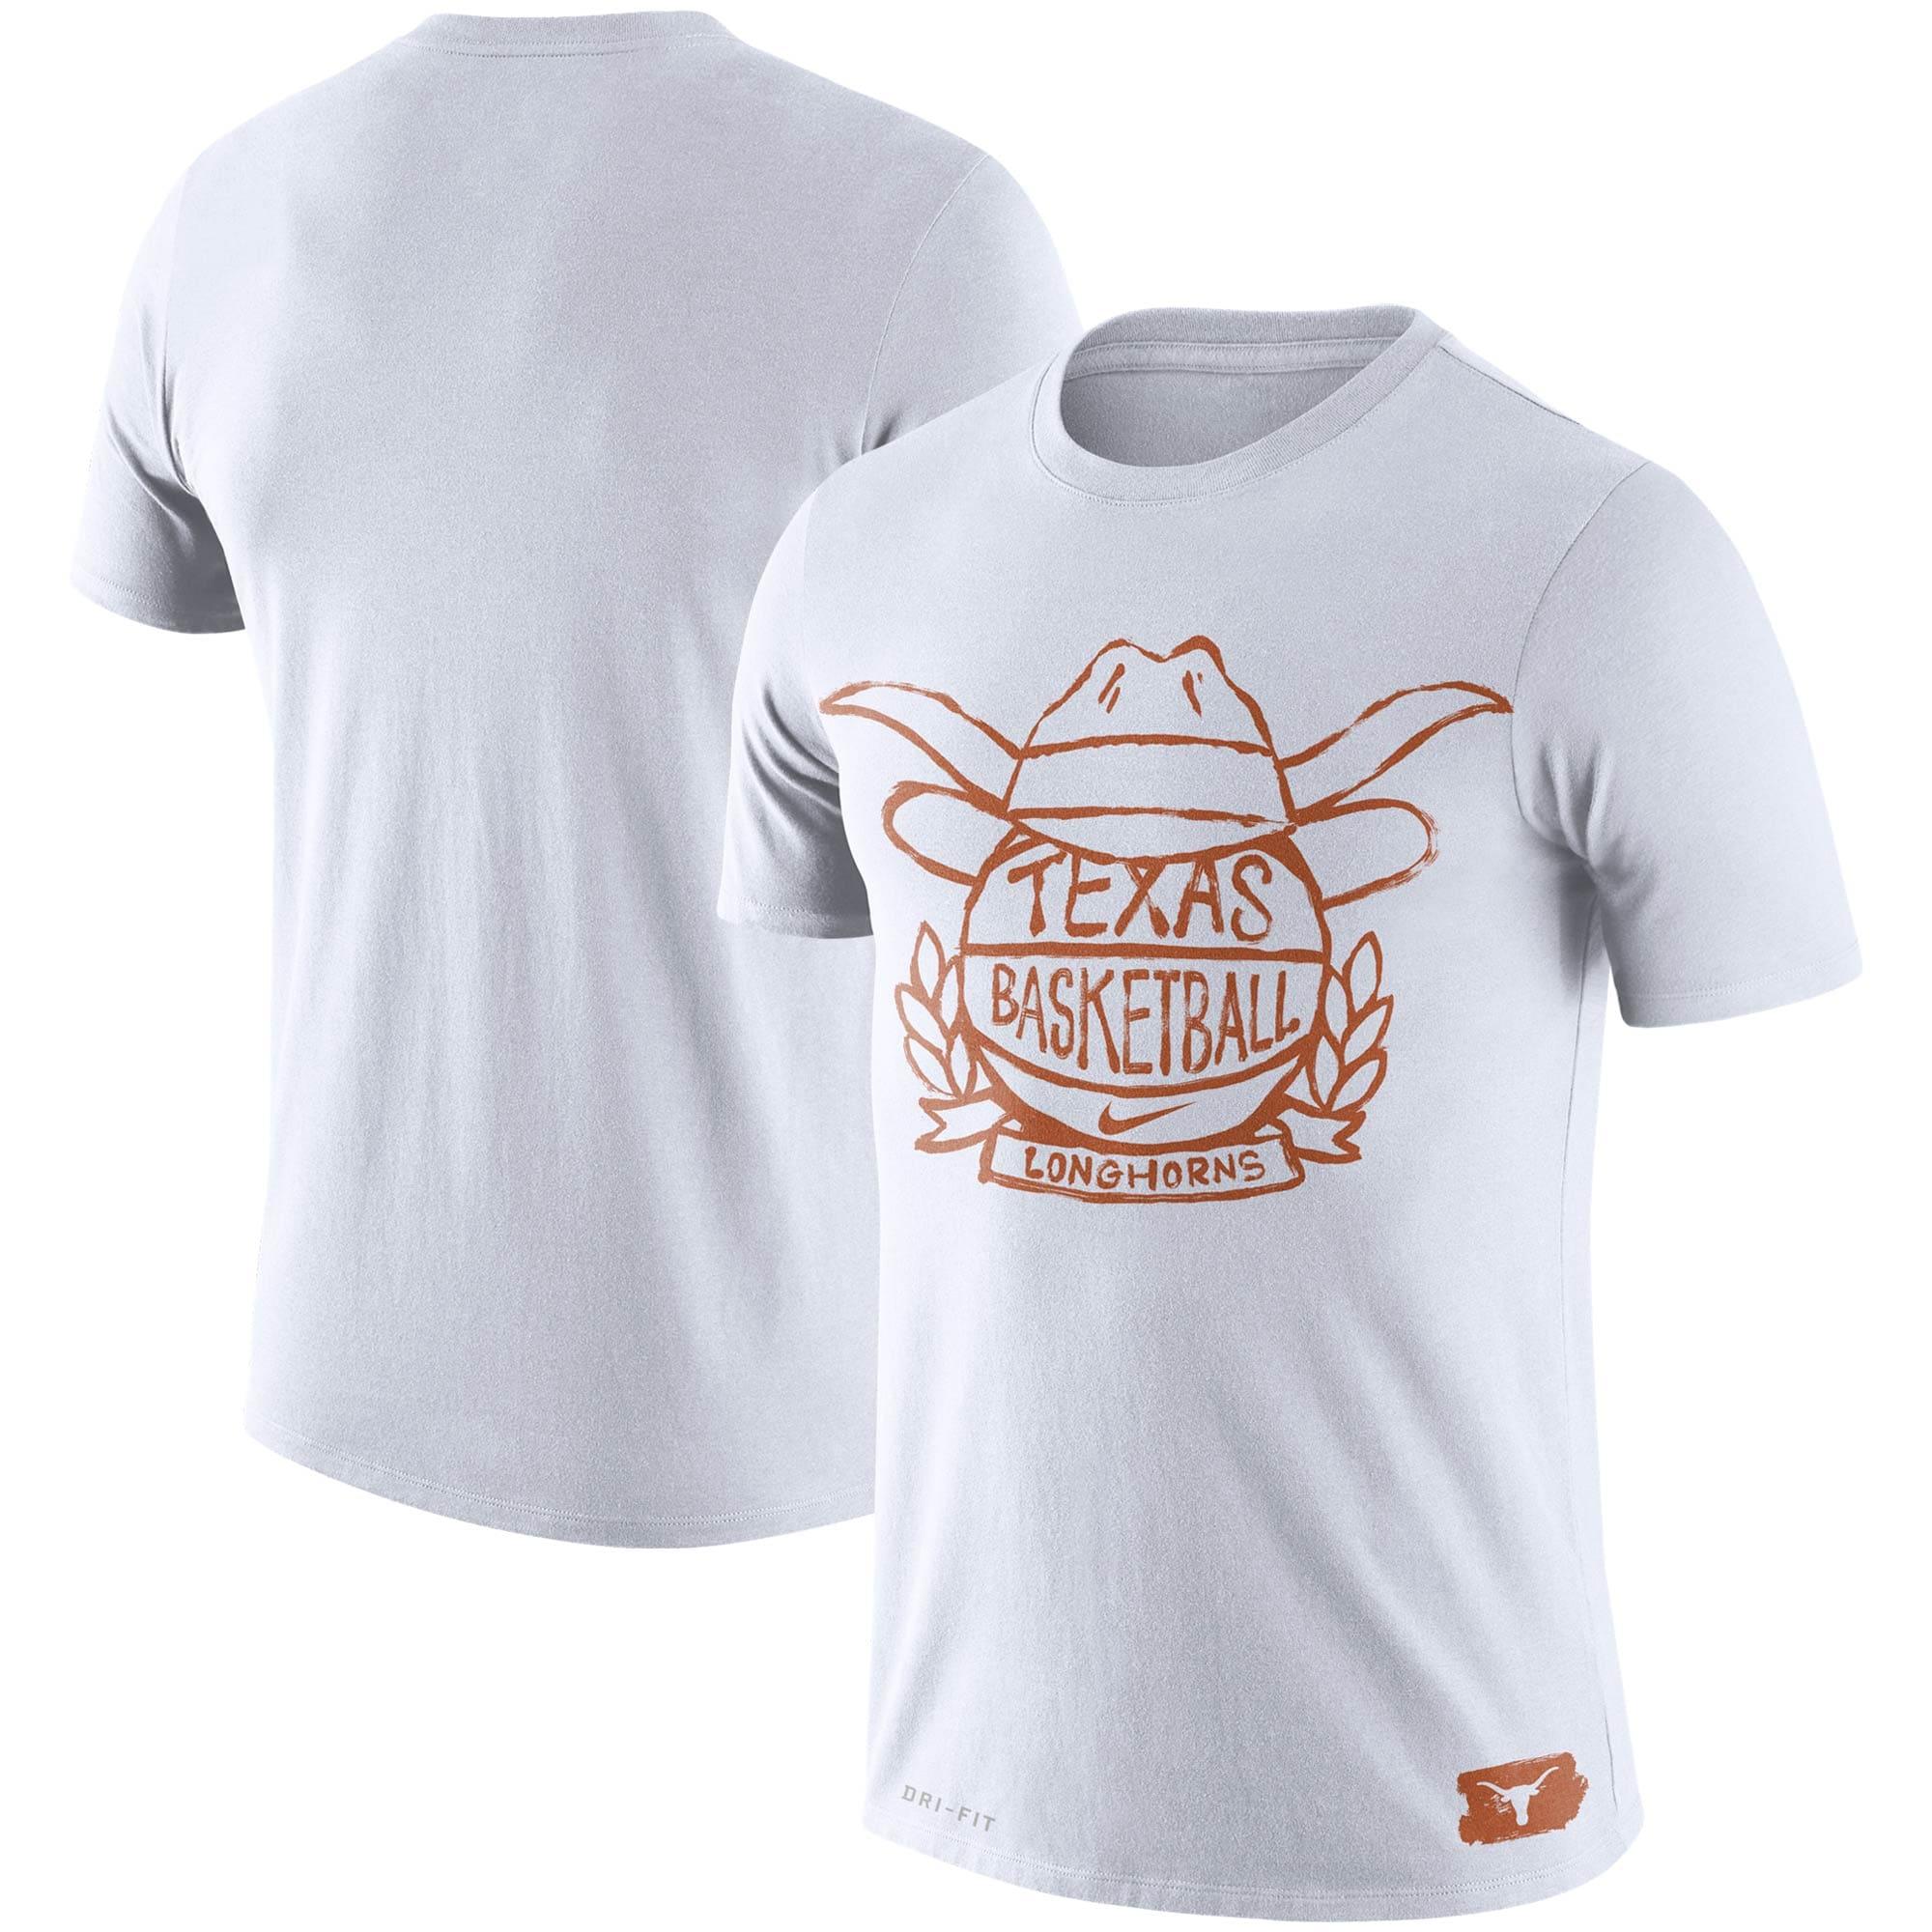 Texas Longhorns Nike Basketball Crest Performance T-Shirt - White